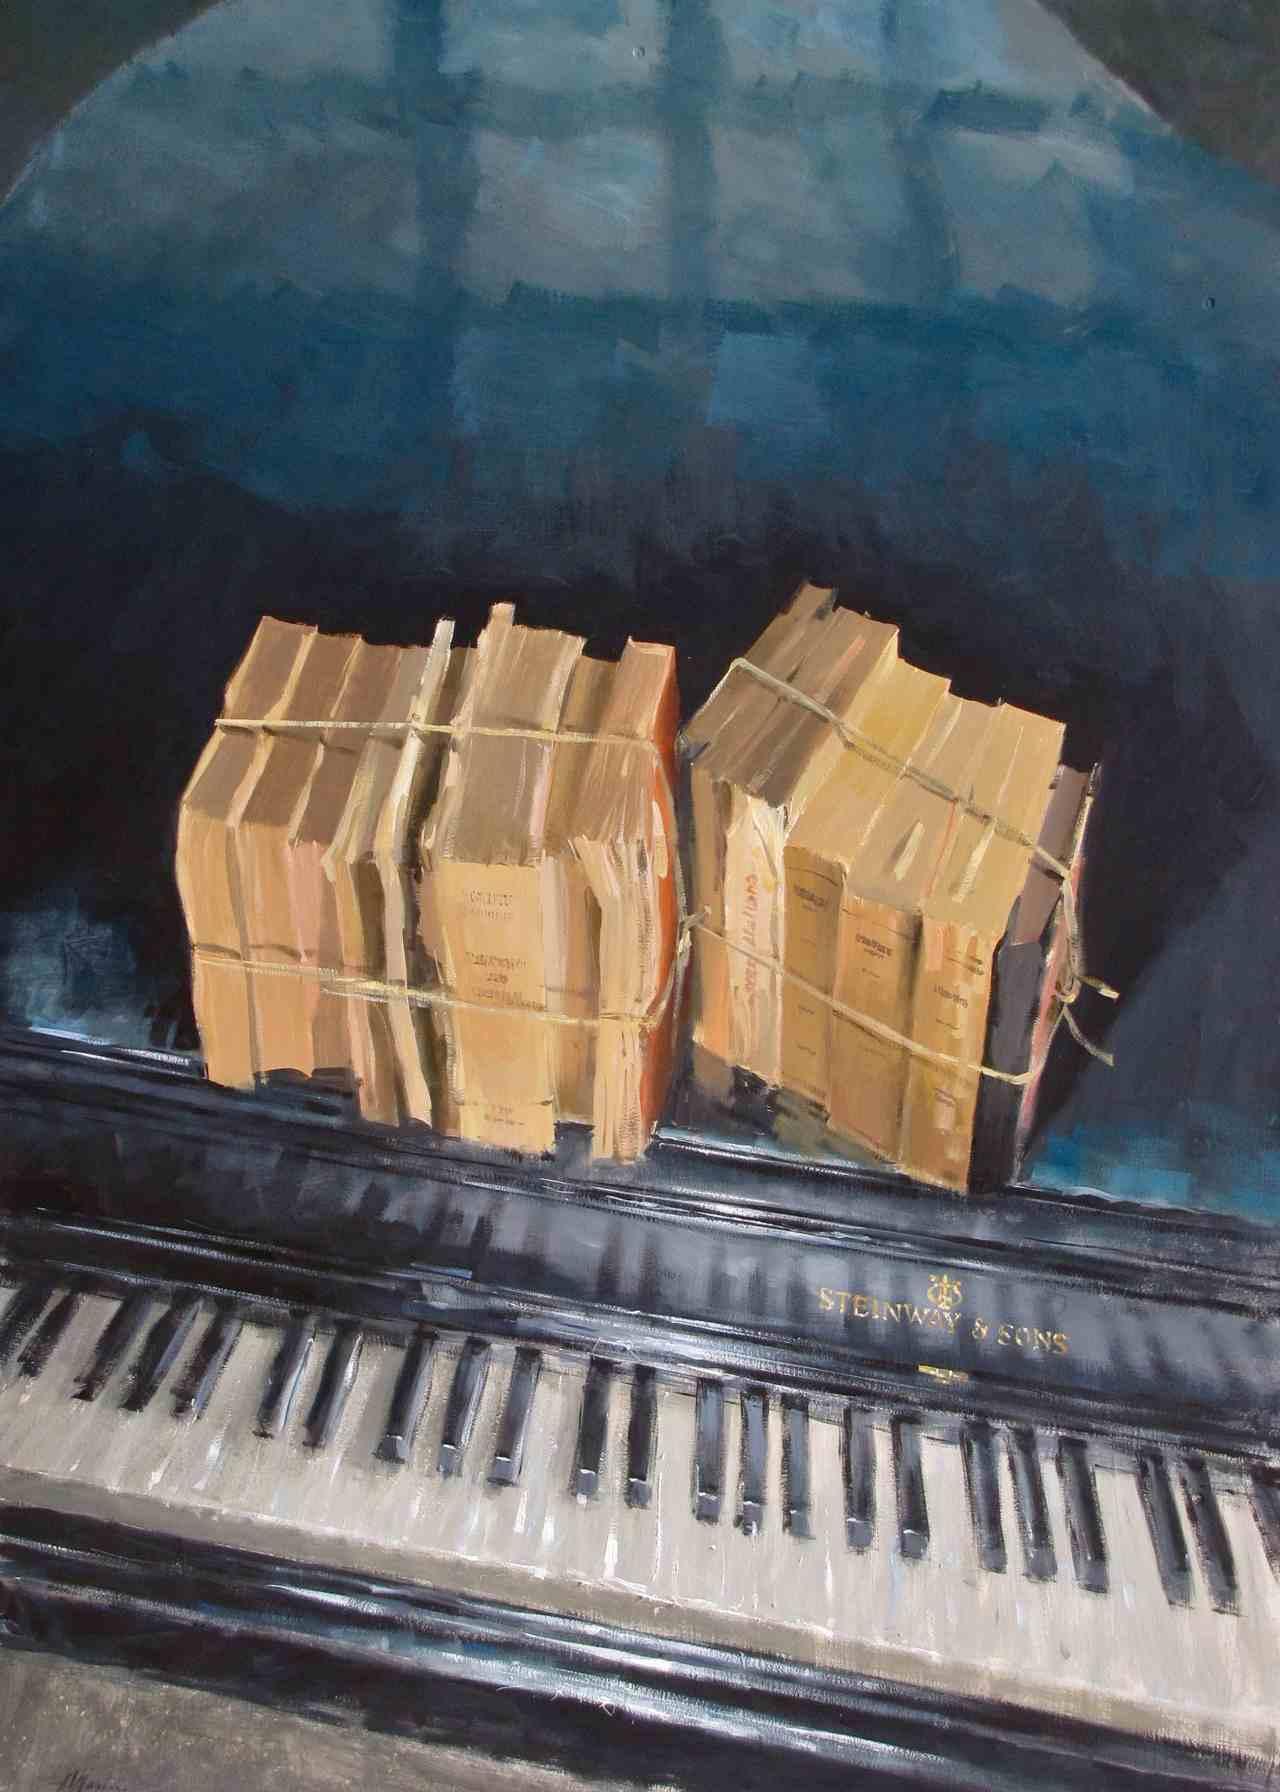 1186, Steinway & Sons, 2010, olio, cm 70x100